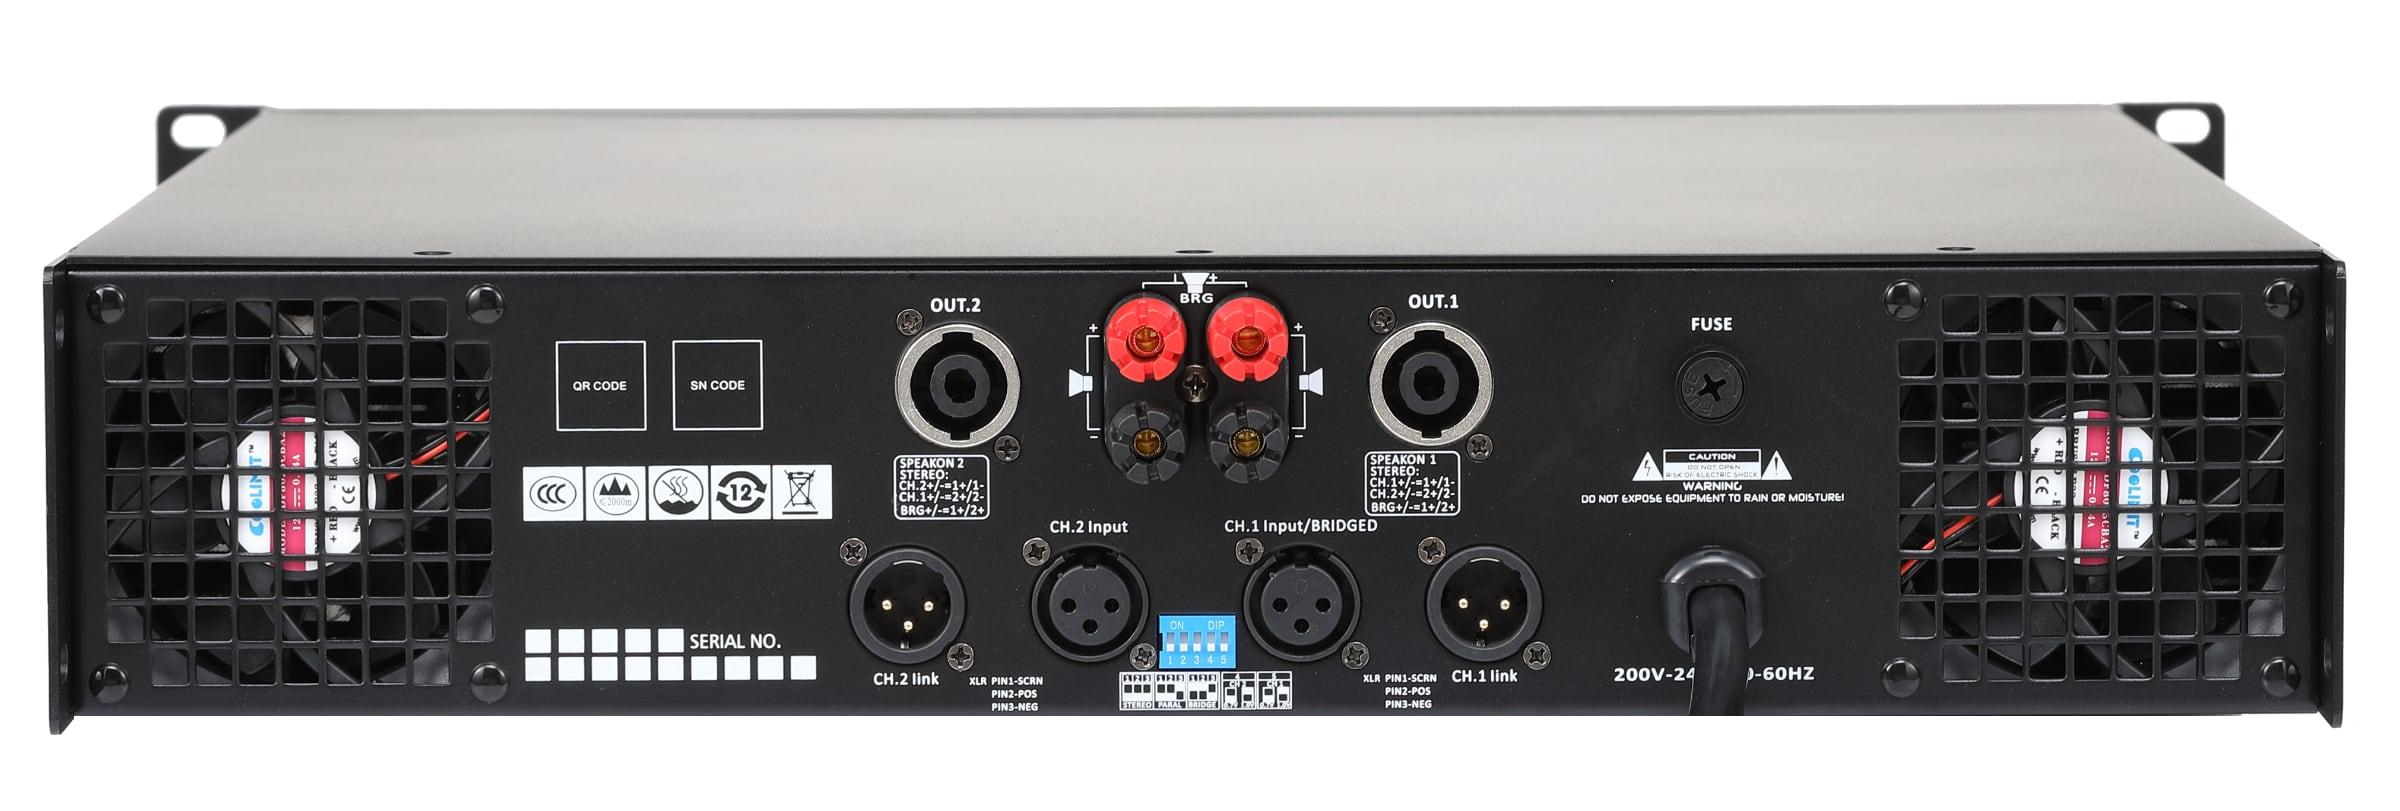 Công suất AAP TD-4002